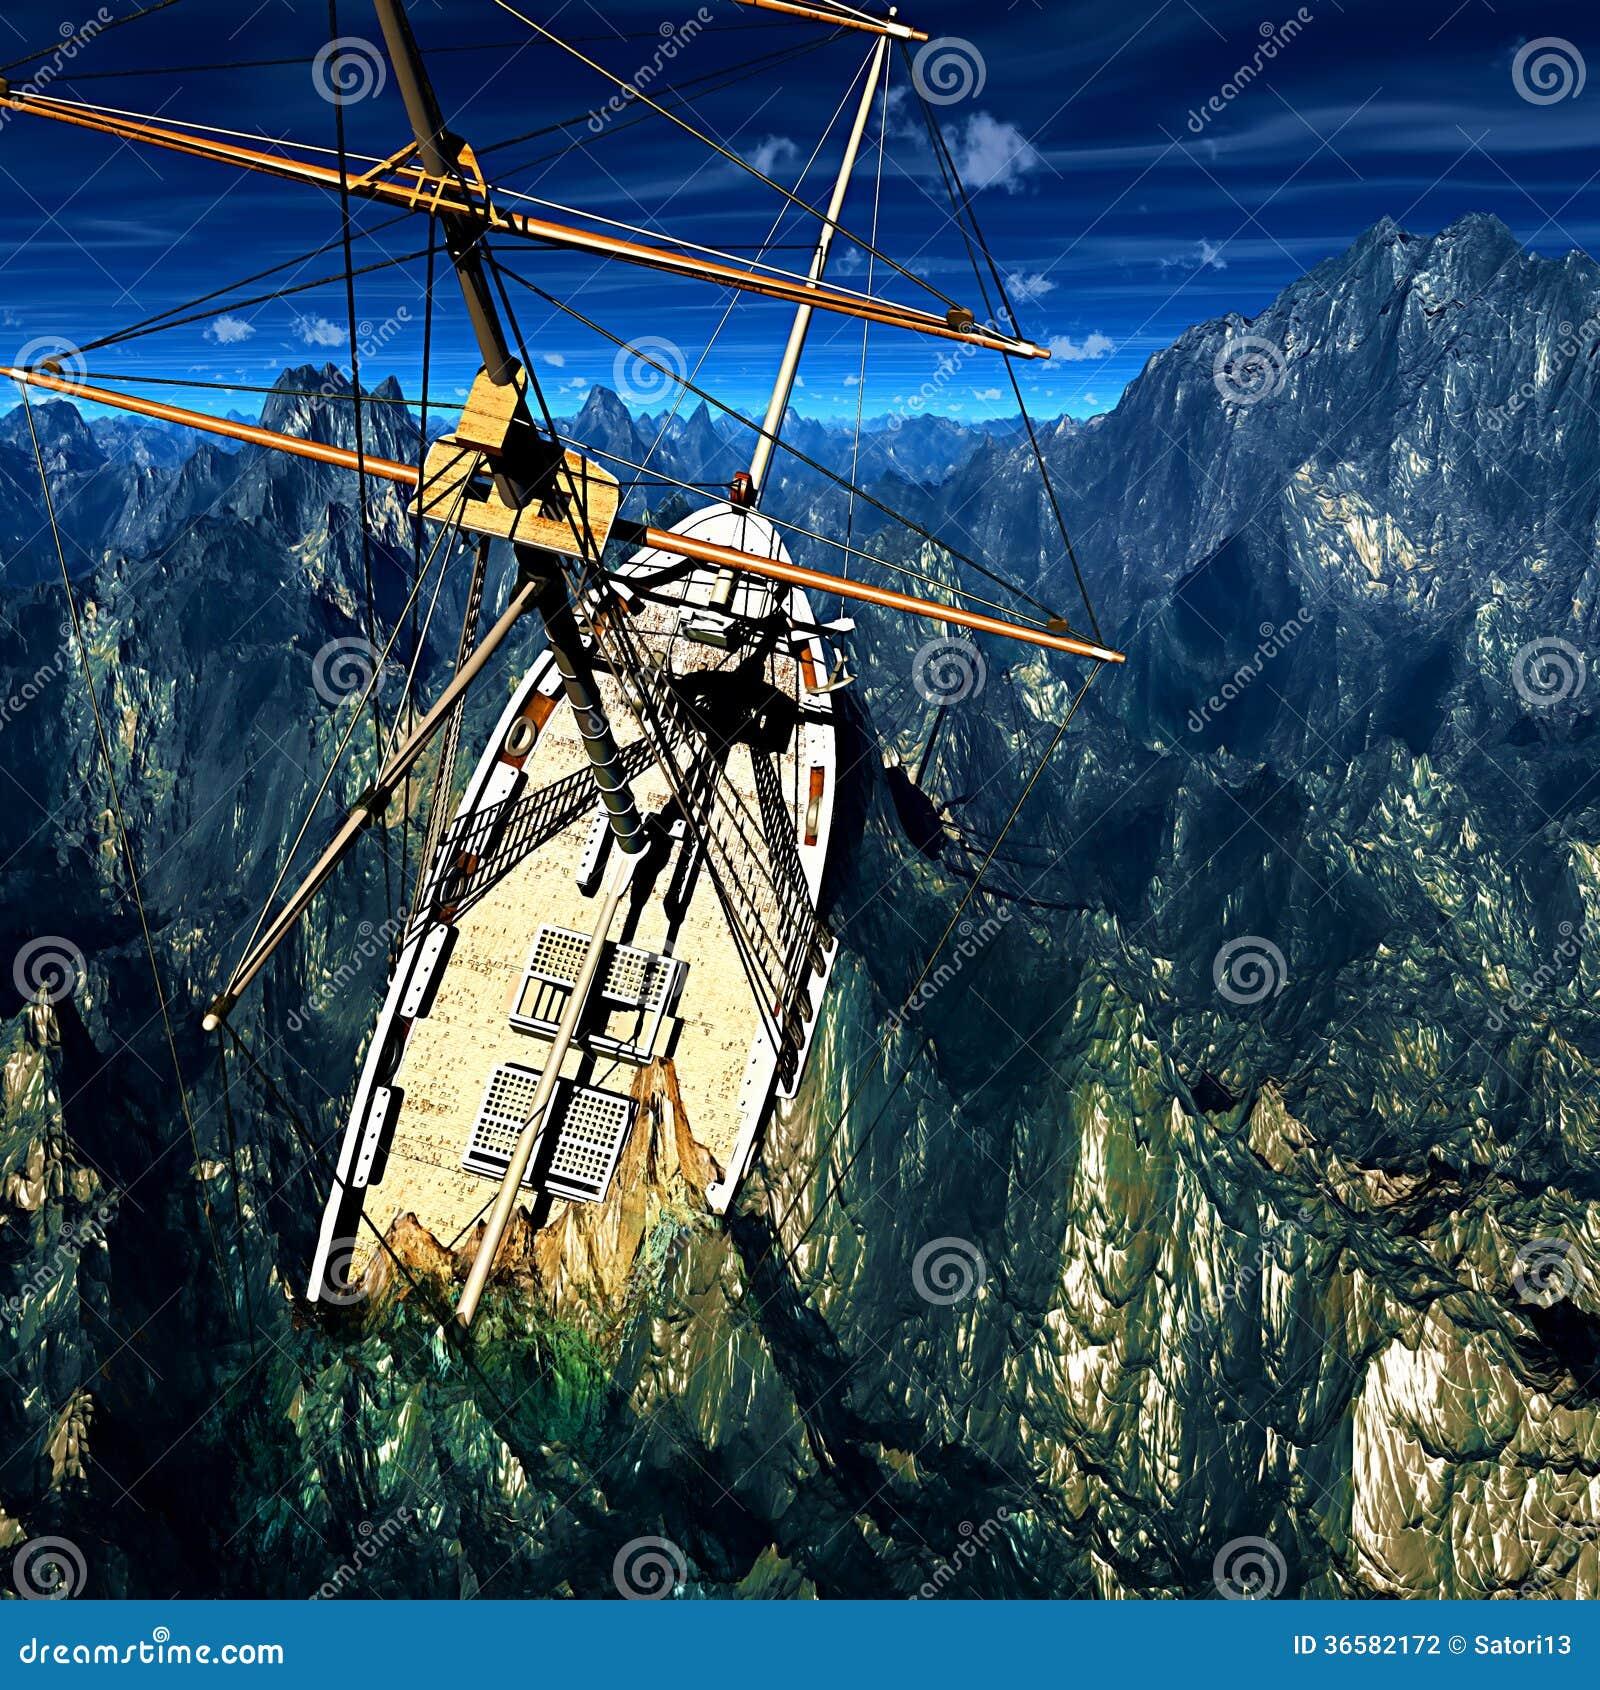 Sinking Pirate Brigantine Stock Photo Image Of Freedom 36582172